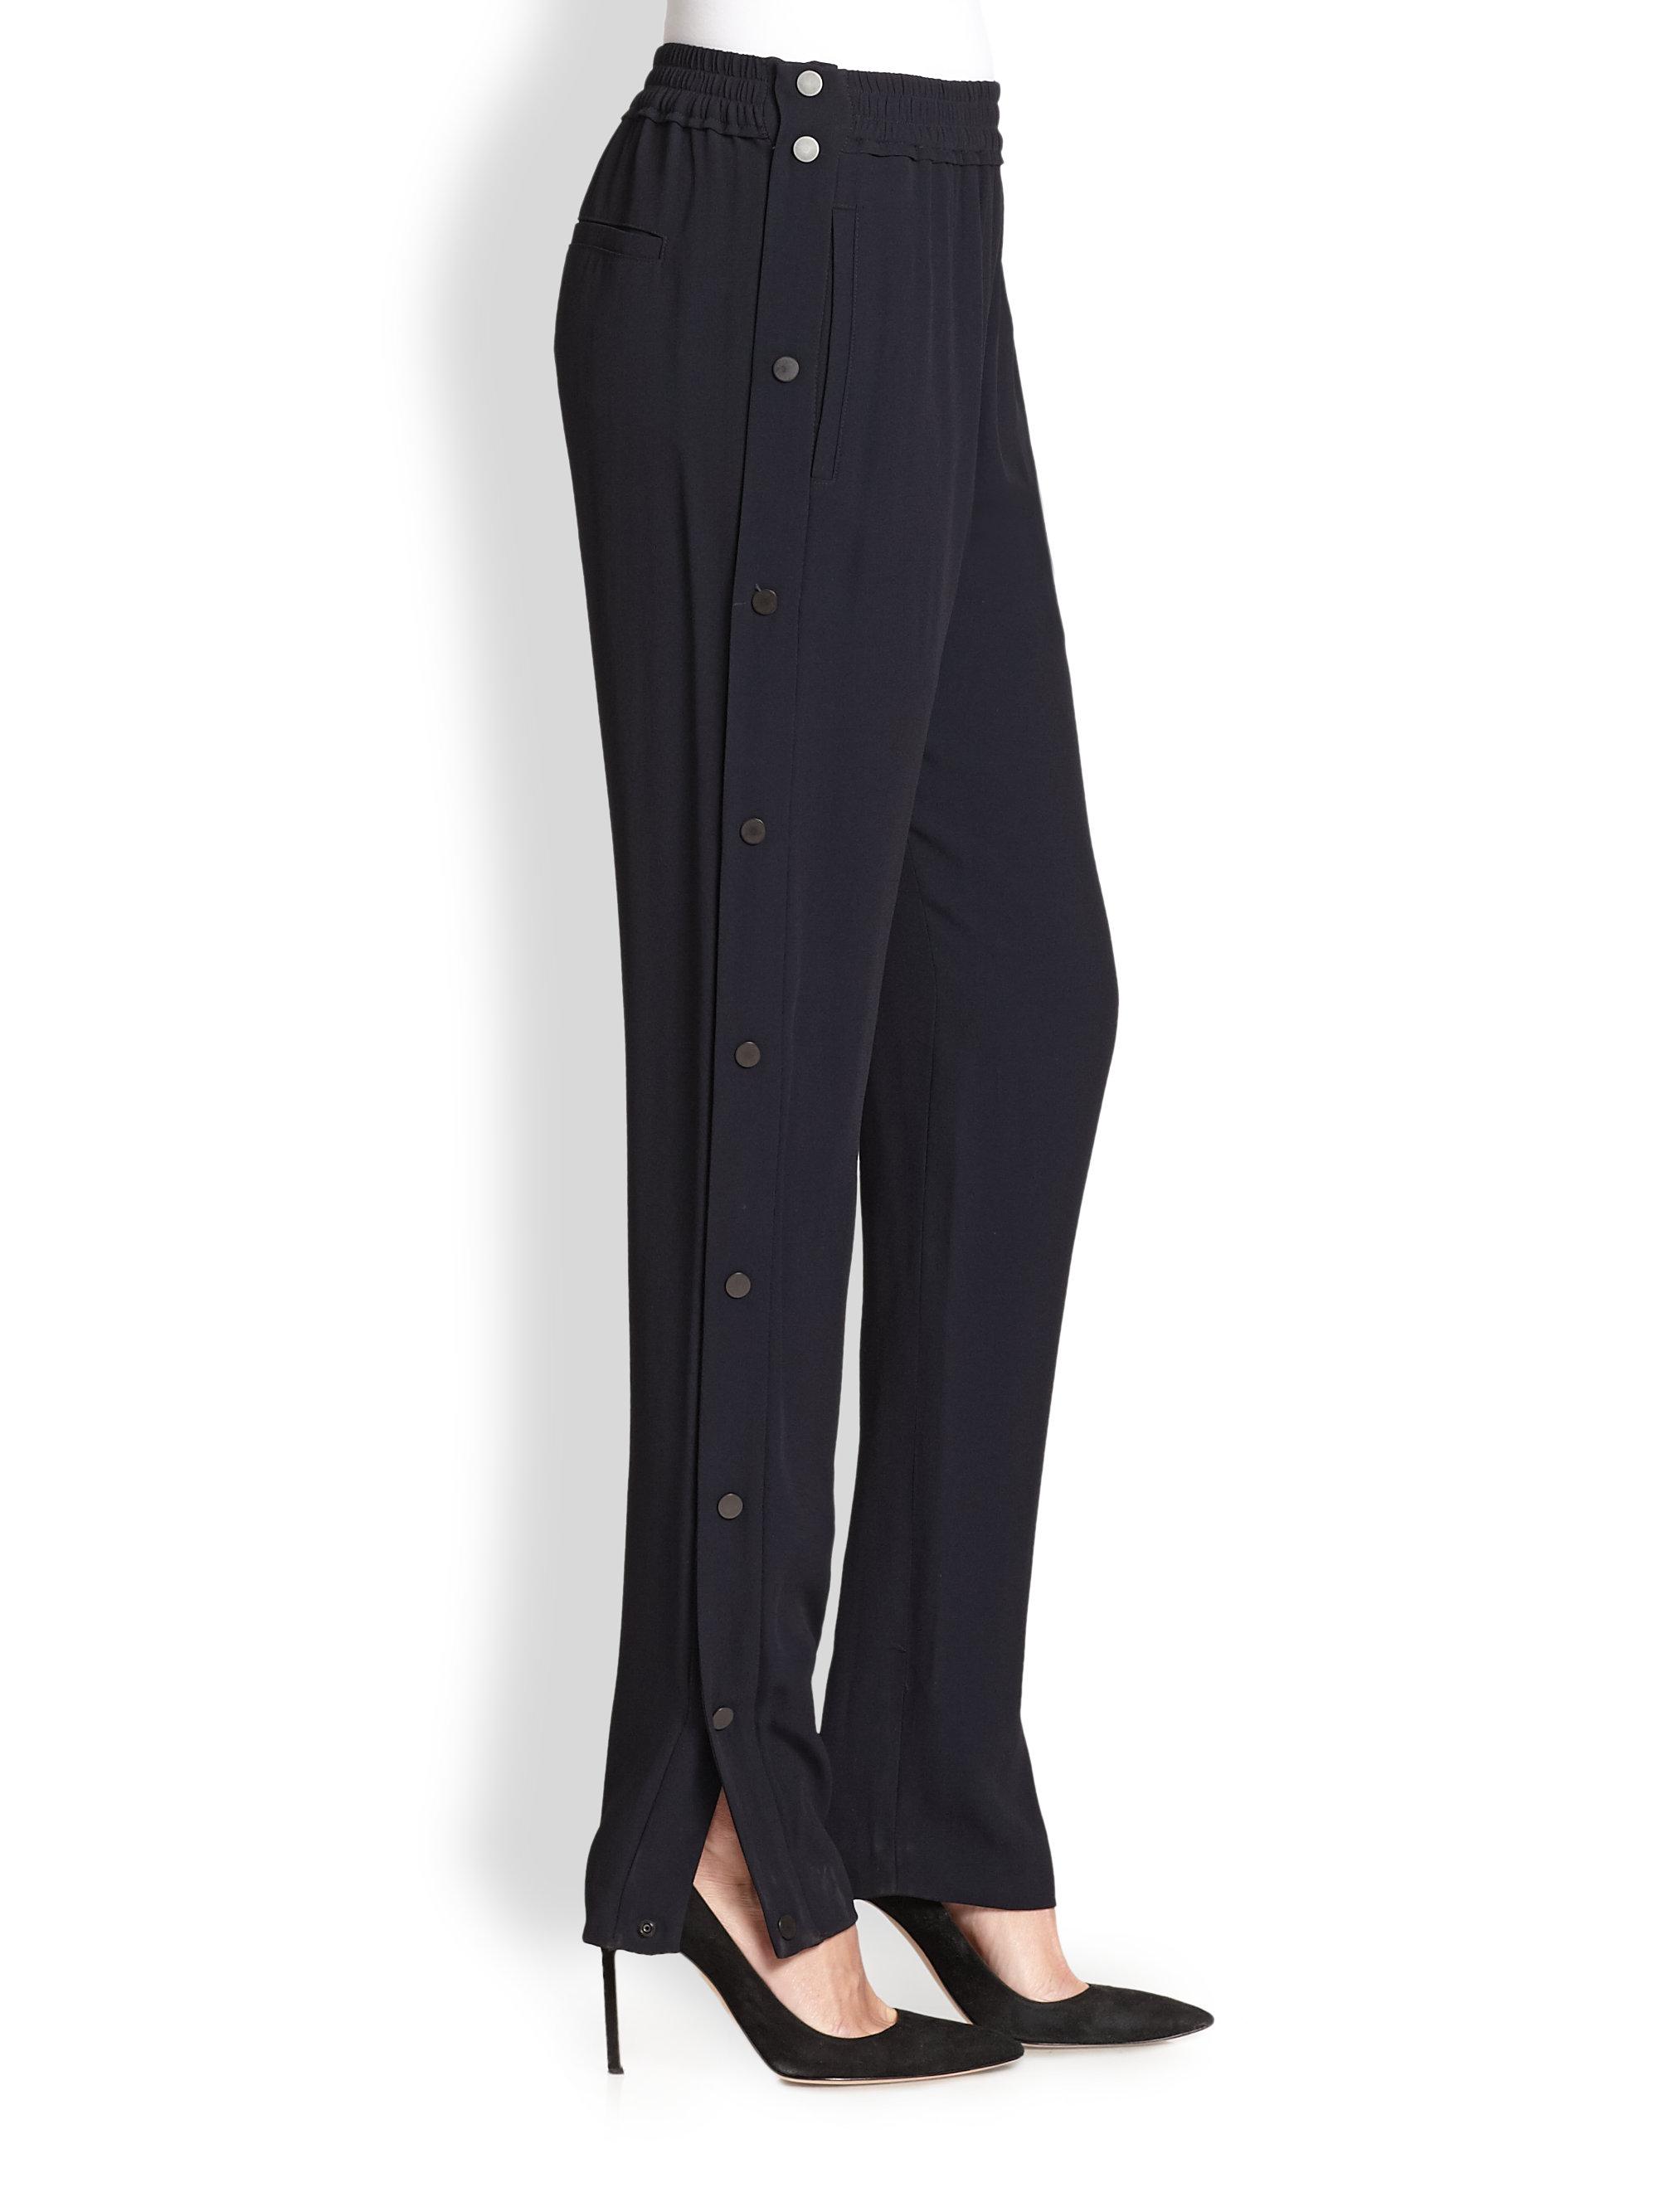 Innovative O-NEWE Loose Casual Elastic Waist Pockets Harem Pants For Women | Elastic Waist Clothes And ...